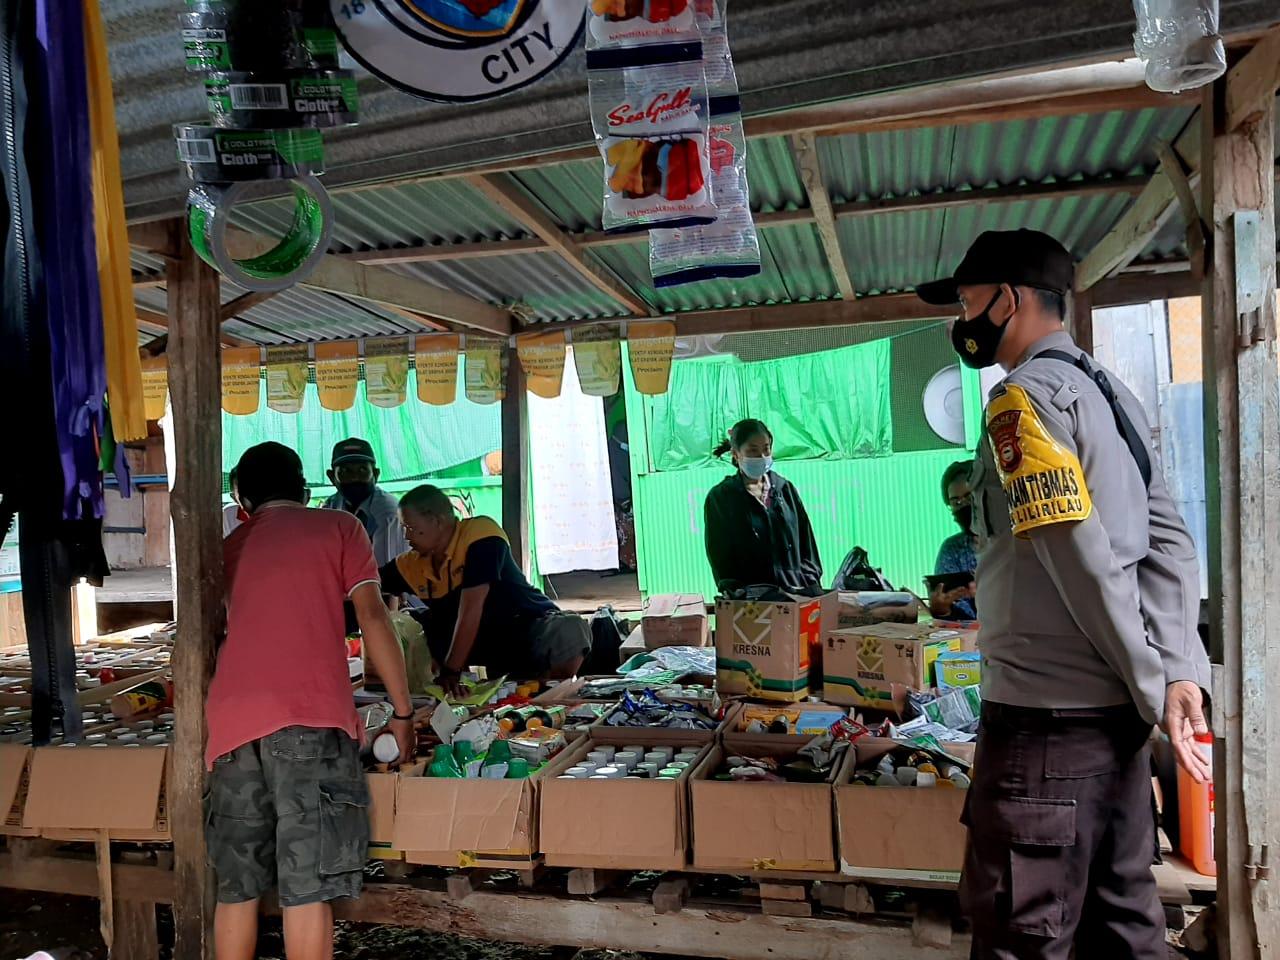 Bhabinkamtibmas Polsek Lilirilau Polres Soppeng Giat Pengamanan Pasar Pallapaoe